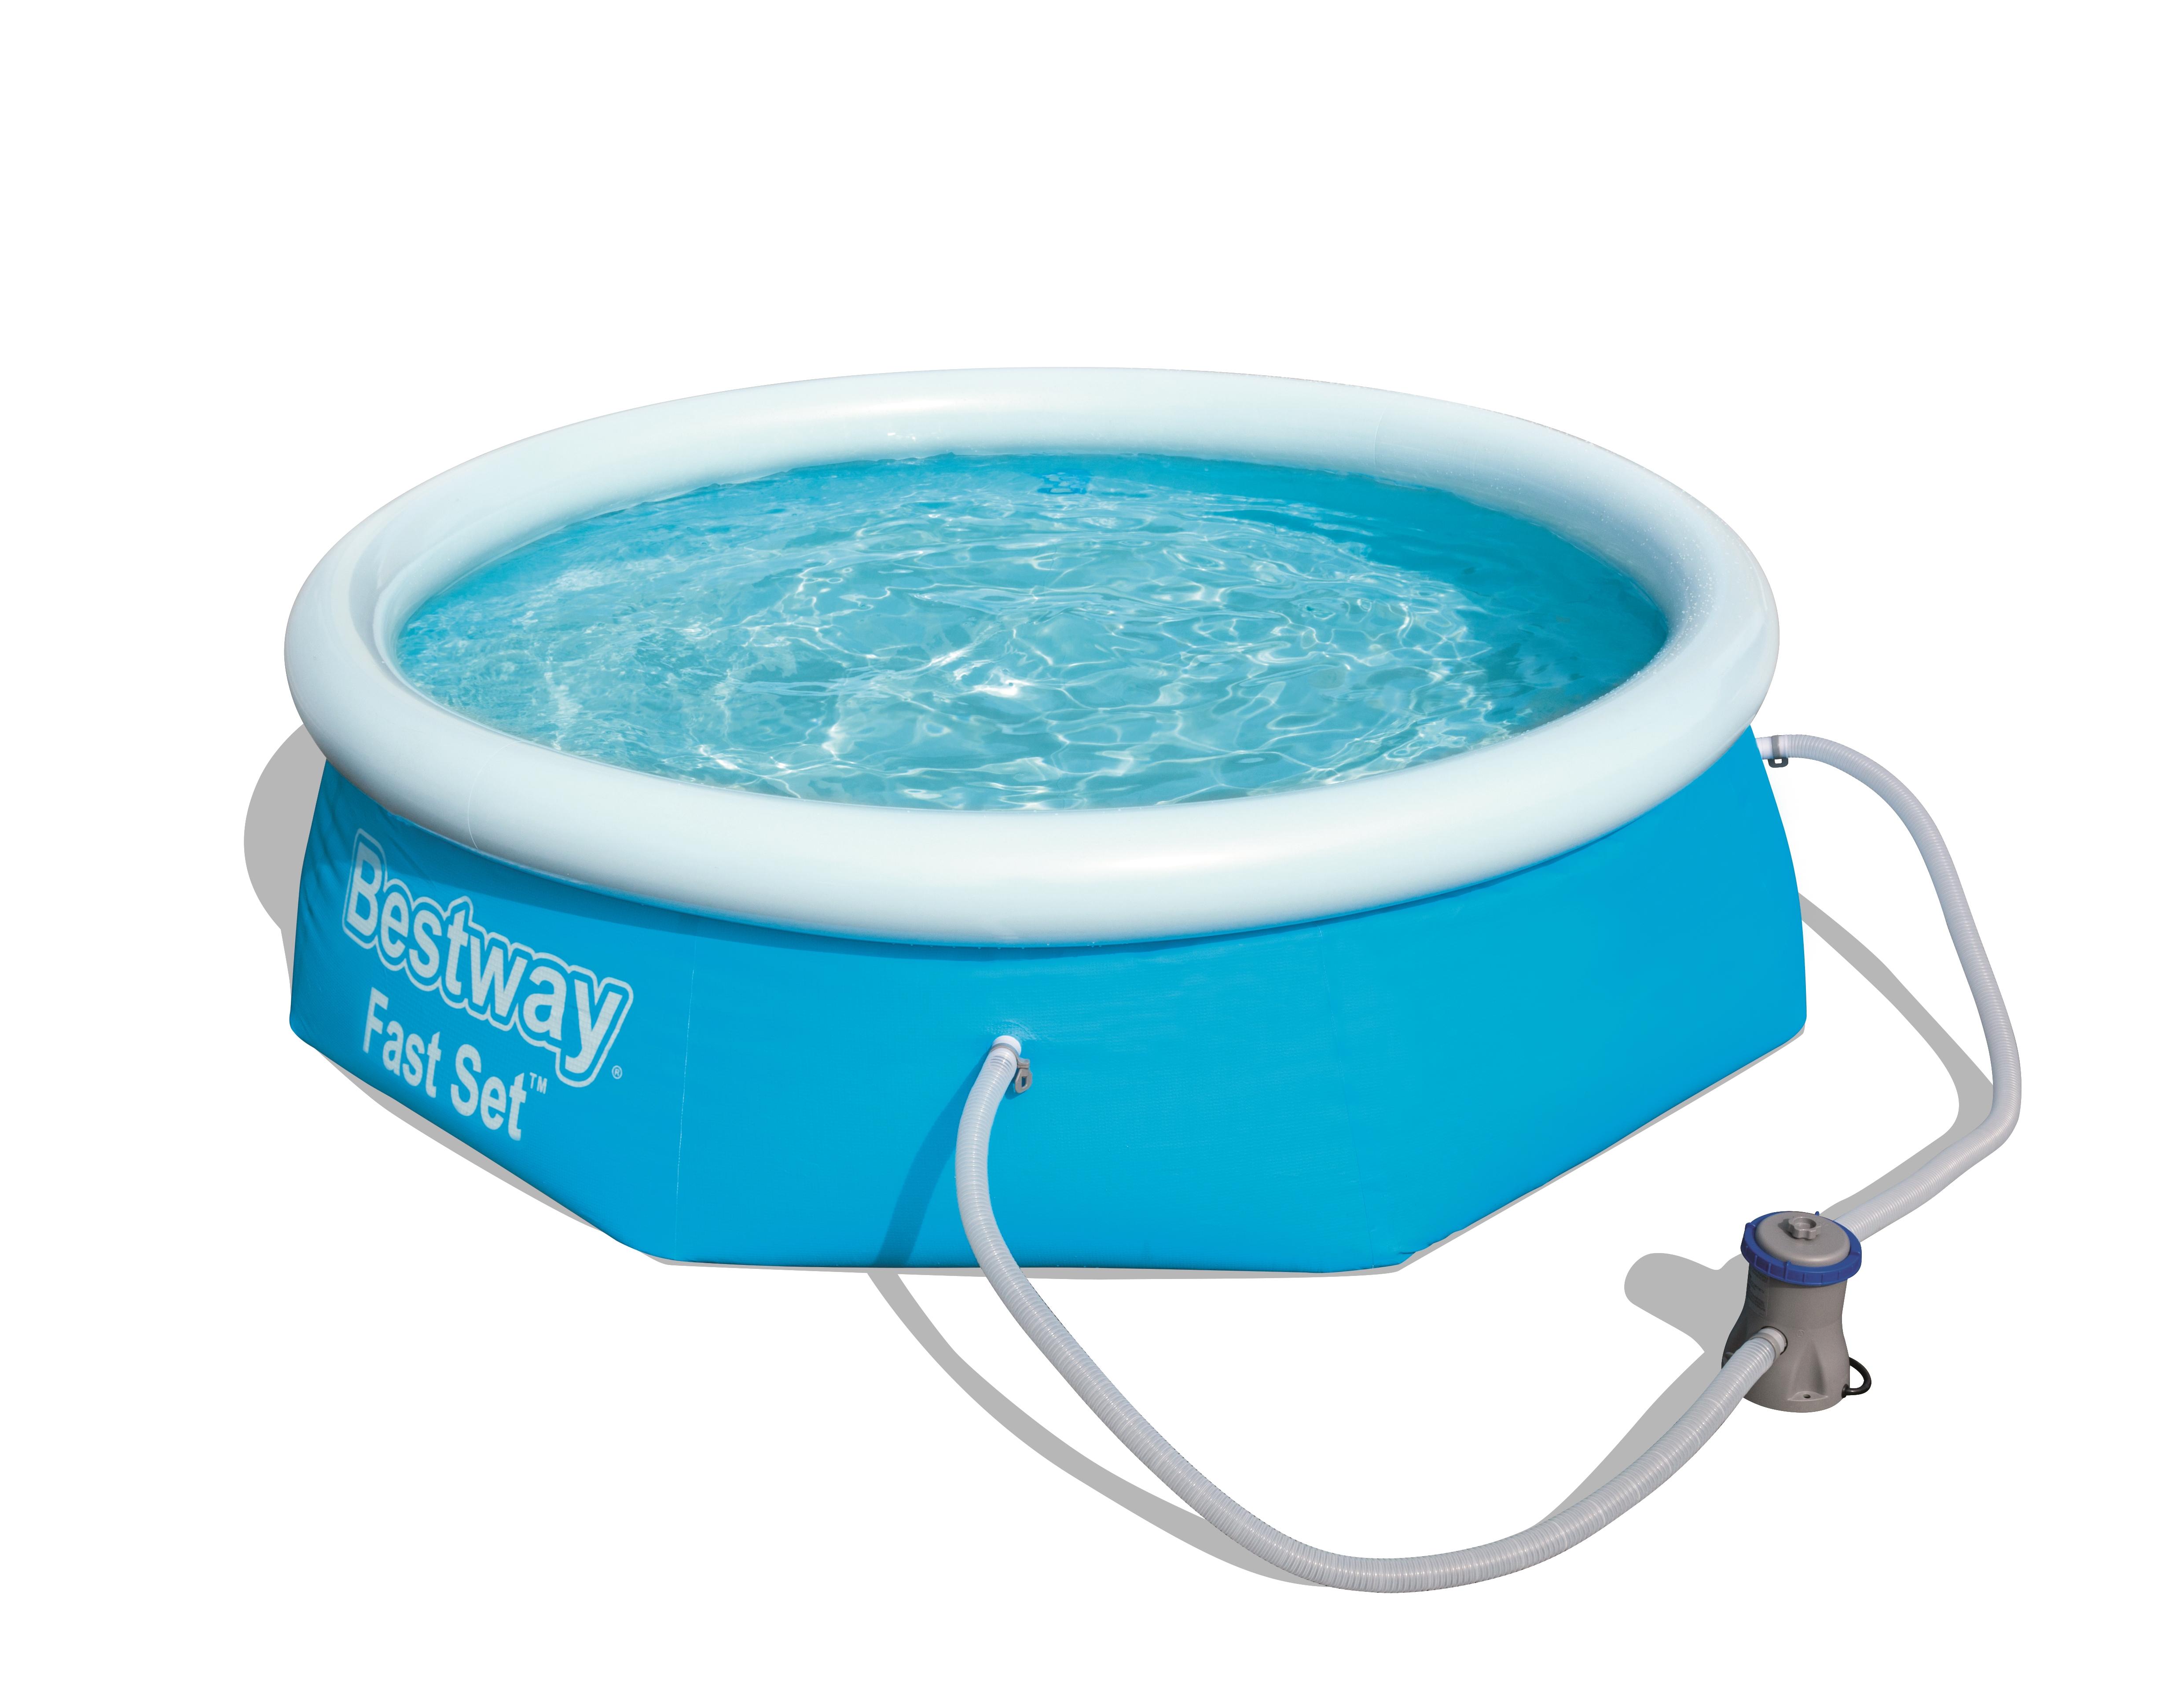 Lay-Z-Spa Bestway Fast Set 57268 - 2300 l - Aufblasbarer Pool - Blau